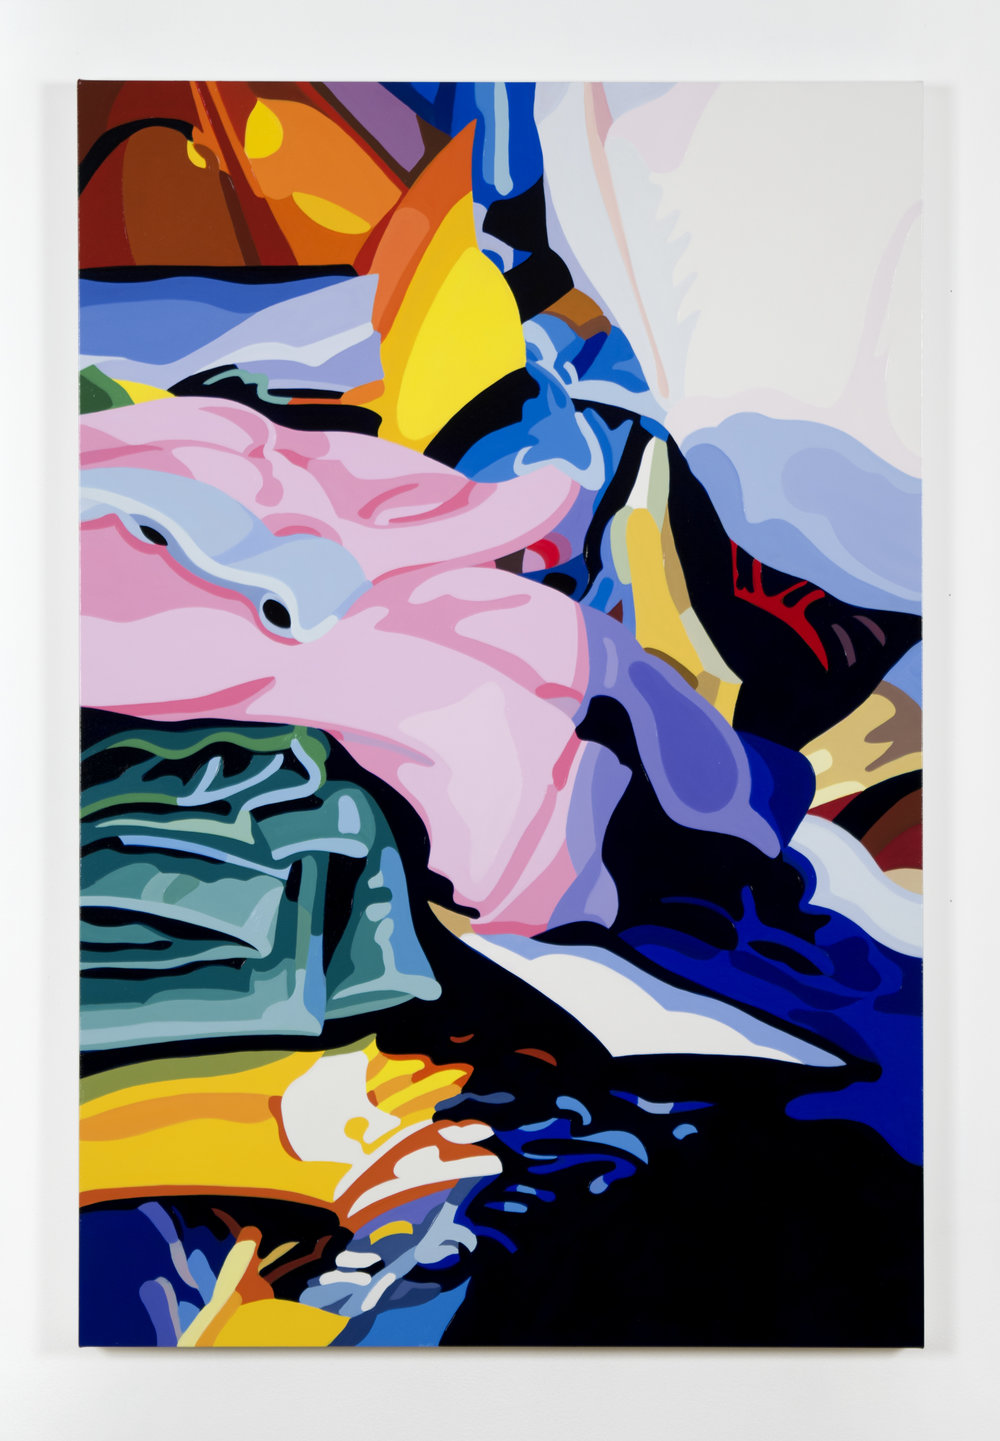 "Ed No. 3, 2017, 36"" x 24"", Oil on Linen"